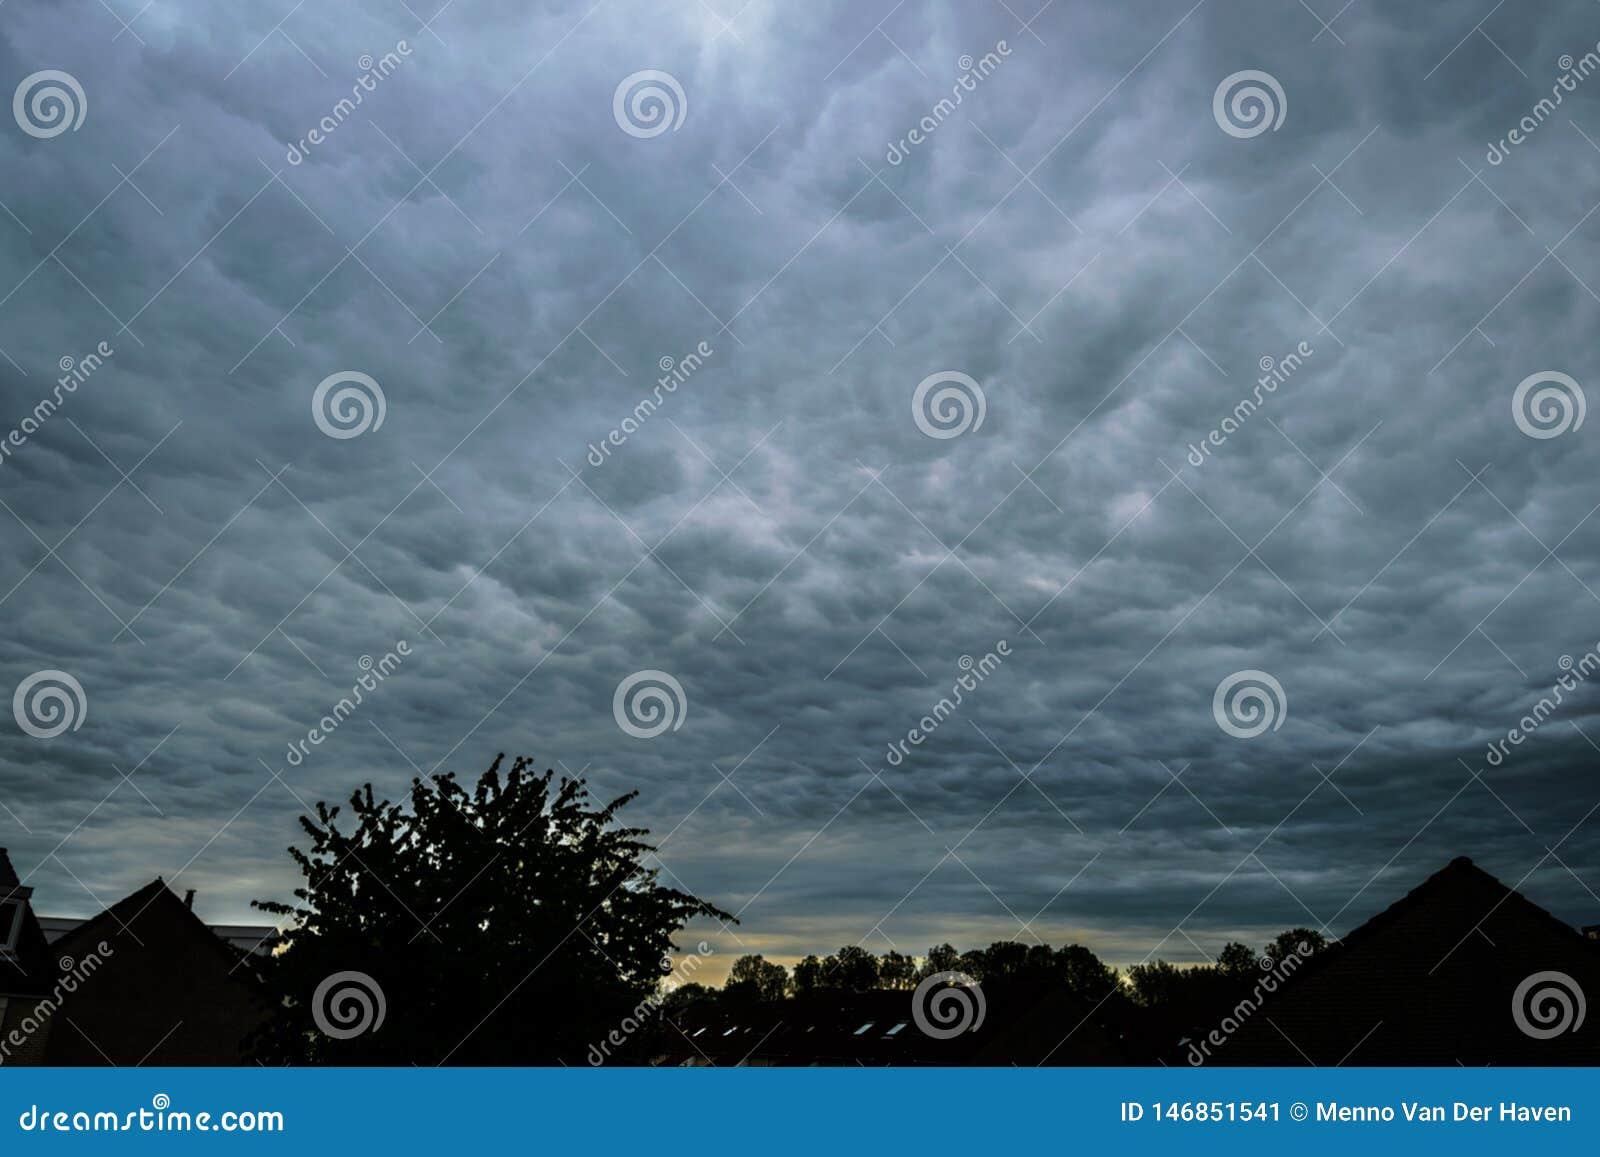 Dramatische hemel van mammatuswolken